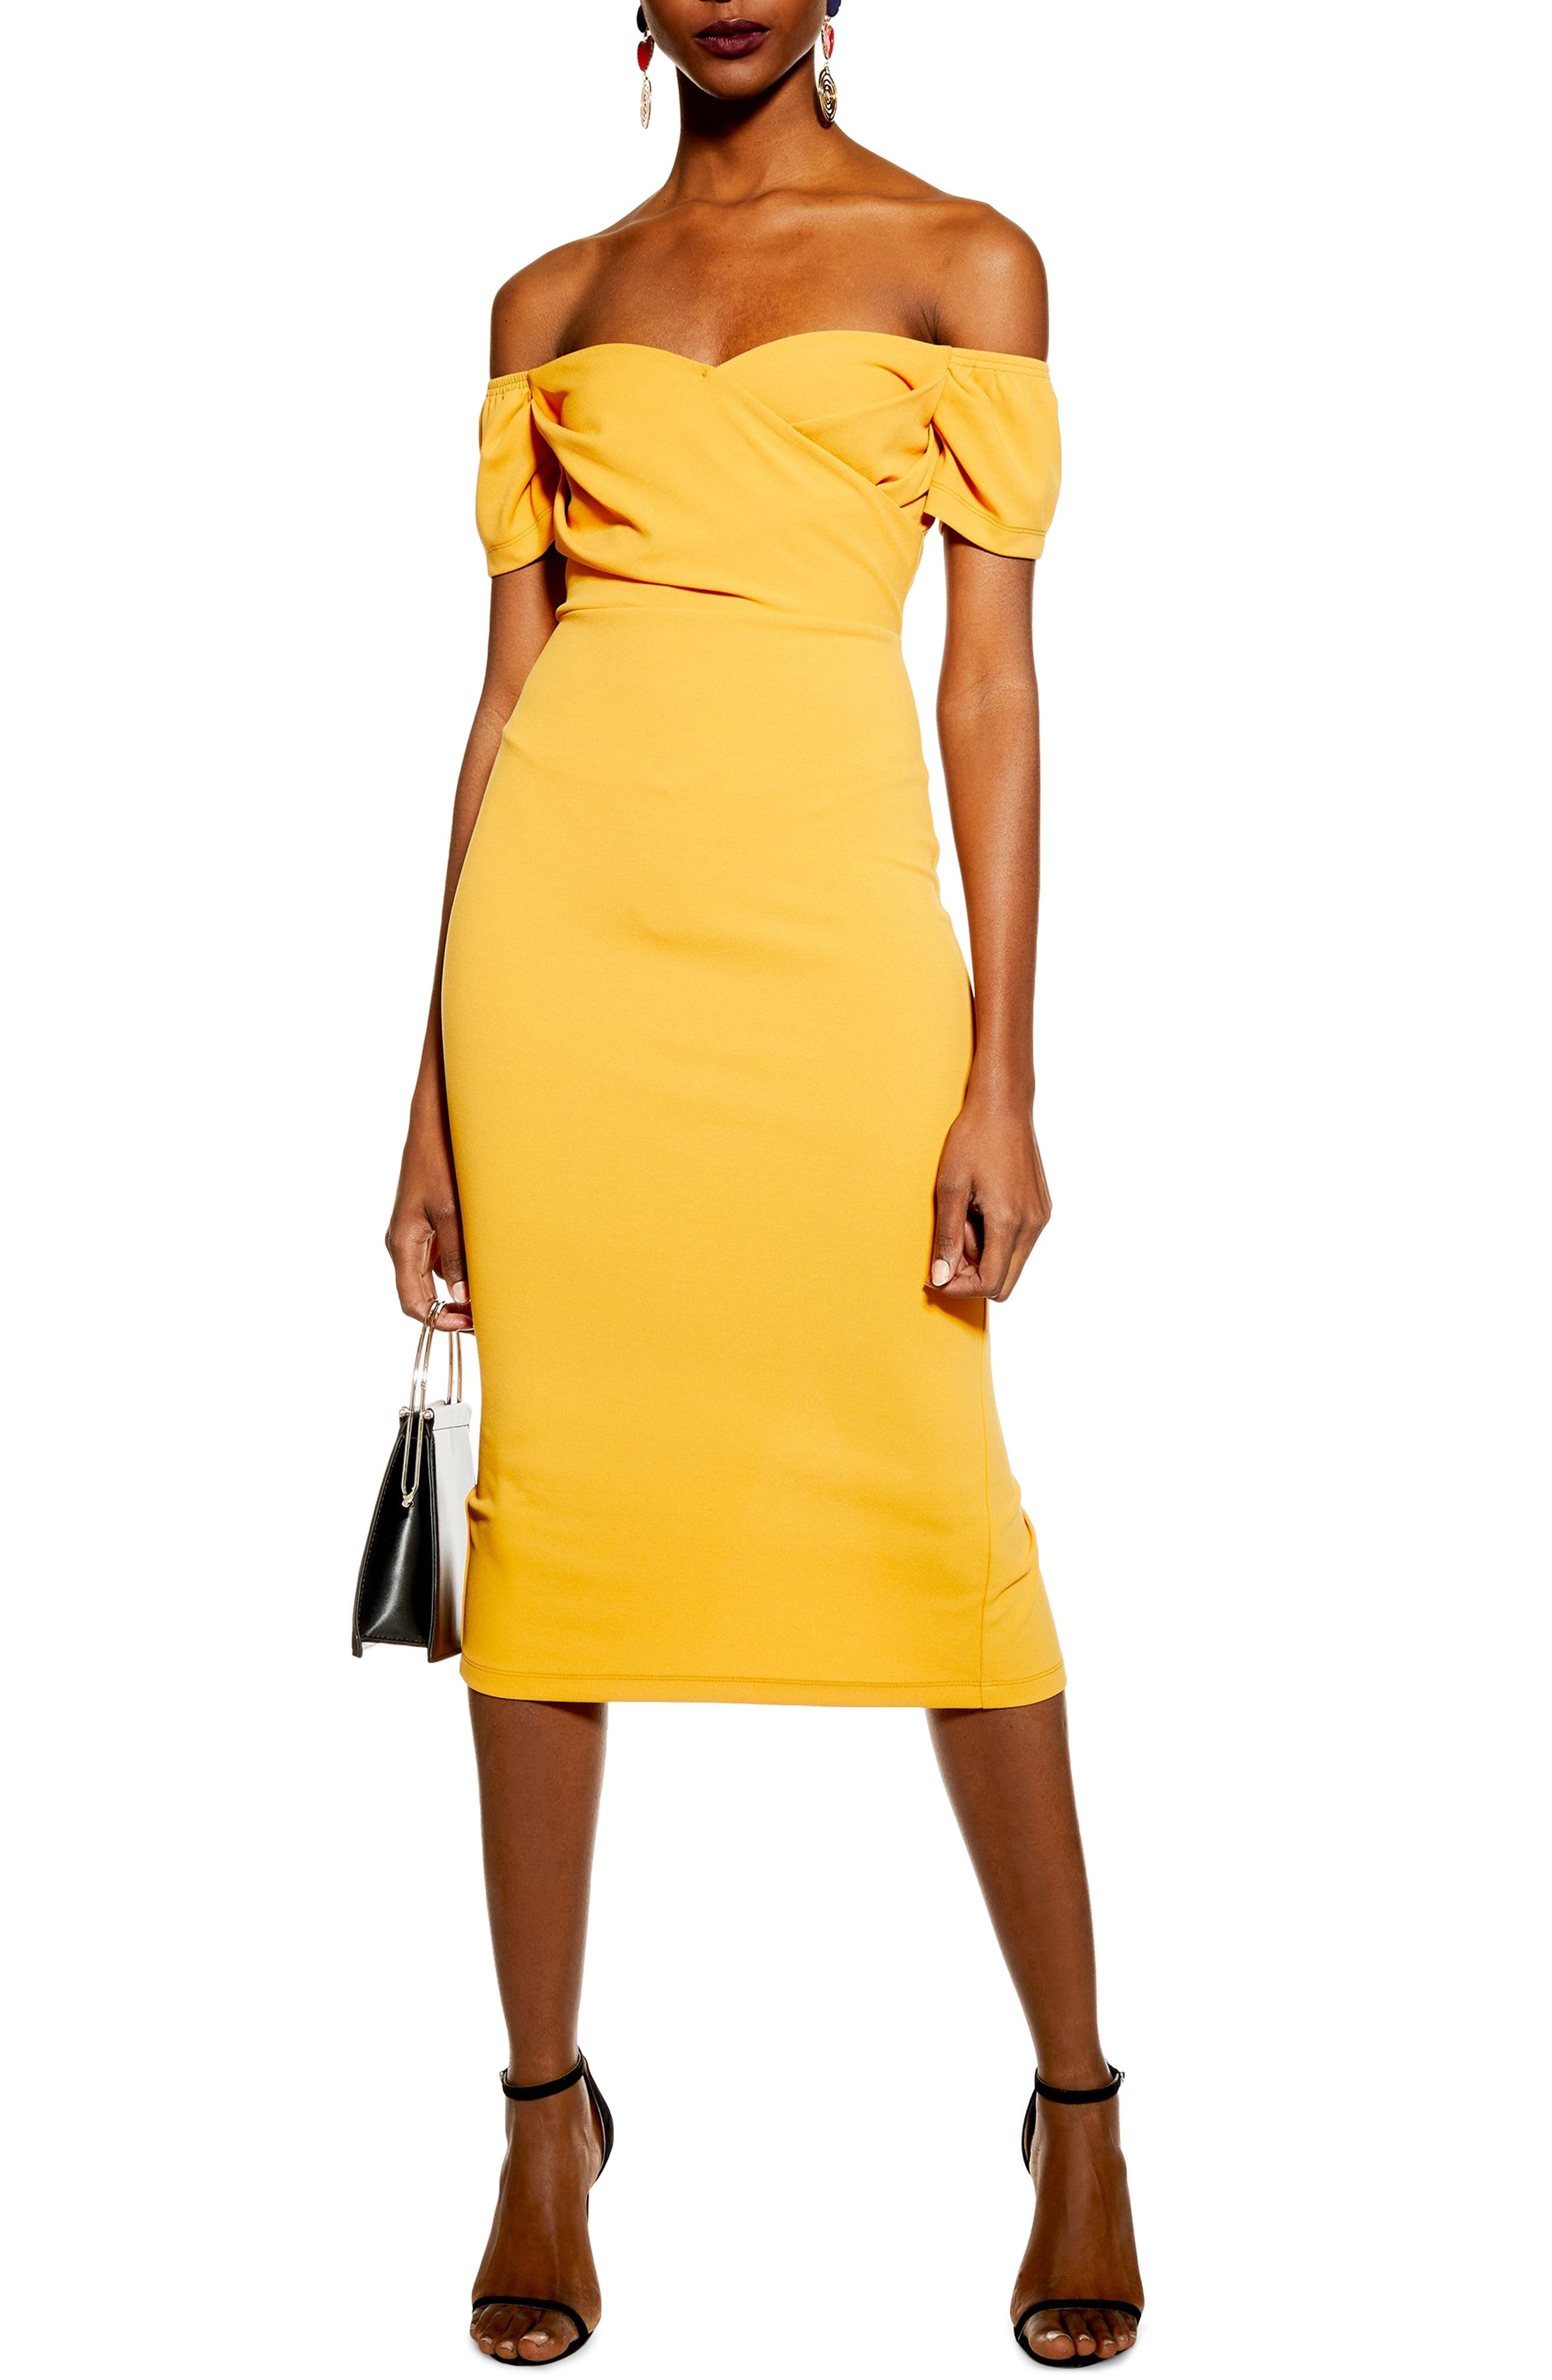 Topshop Off The Shoulder Wrap Midi Dress, US (fits like 2-4) - Orange